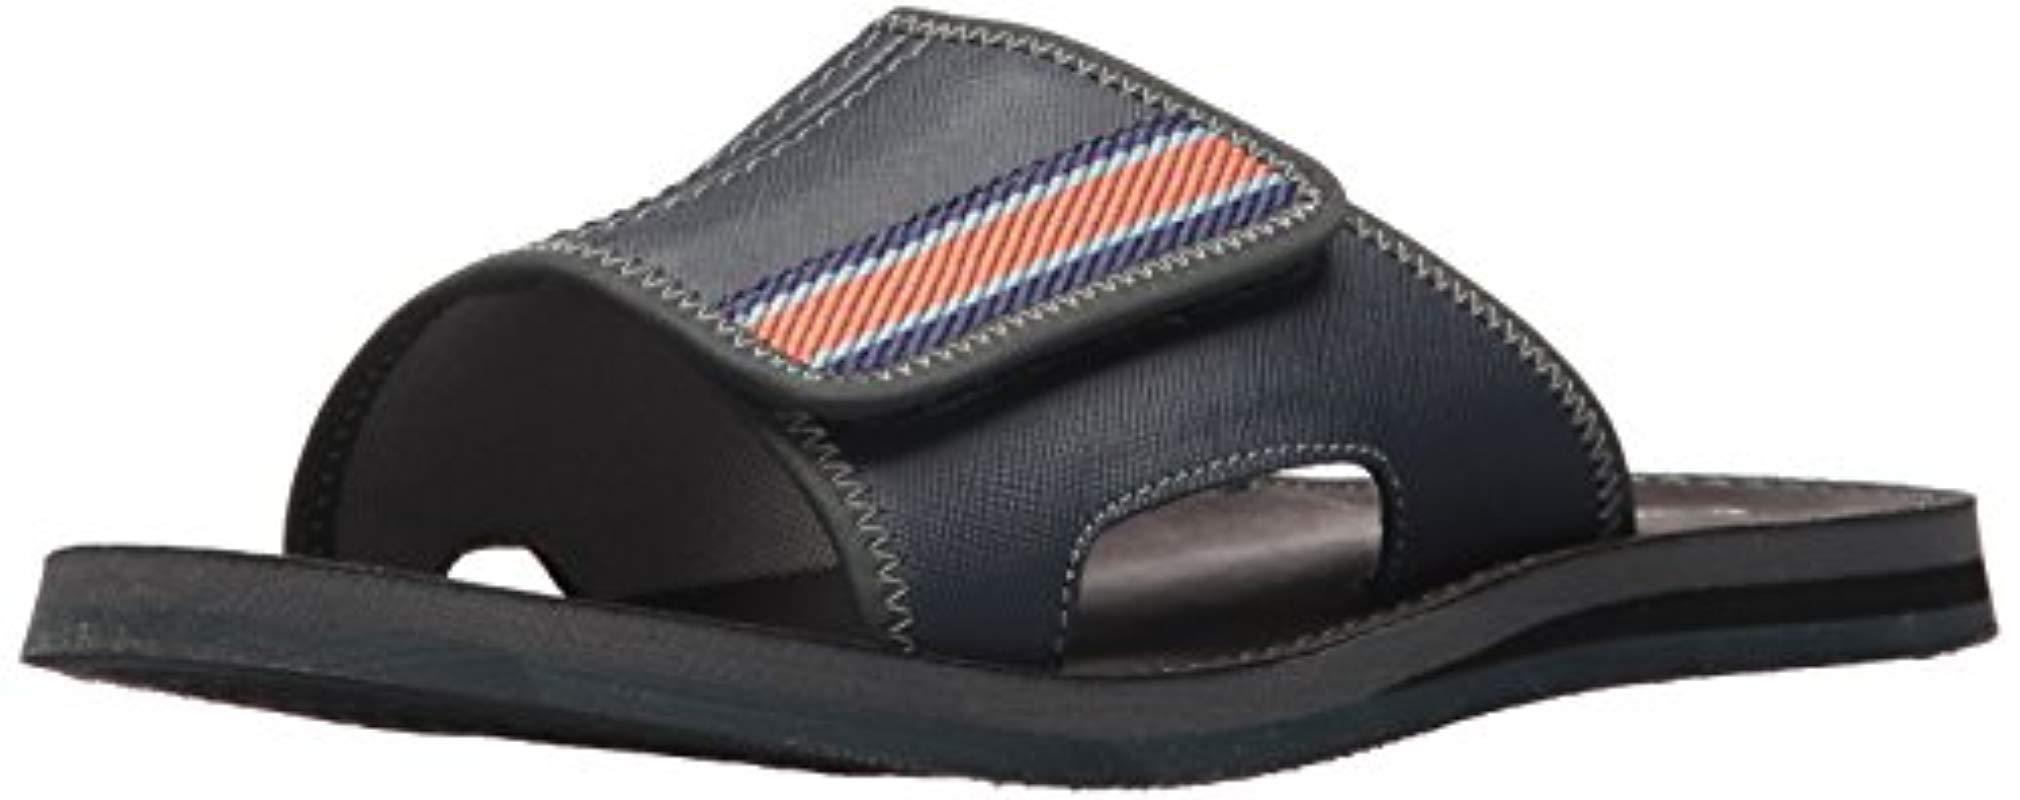 8ae88aa17b9c Lyst - Clarks Lacono Bay Slide Sandal for Men - Save 25%